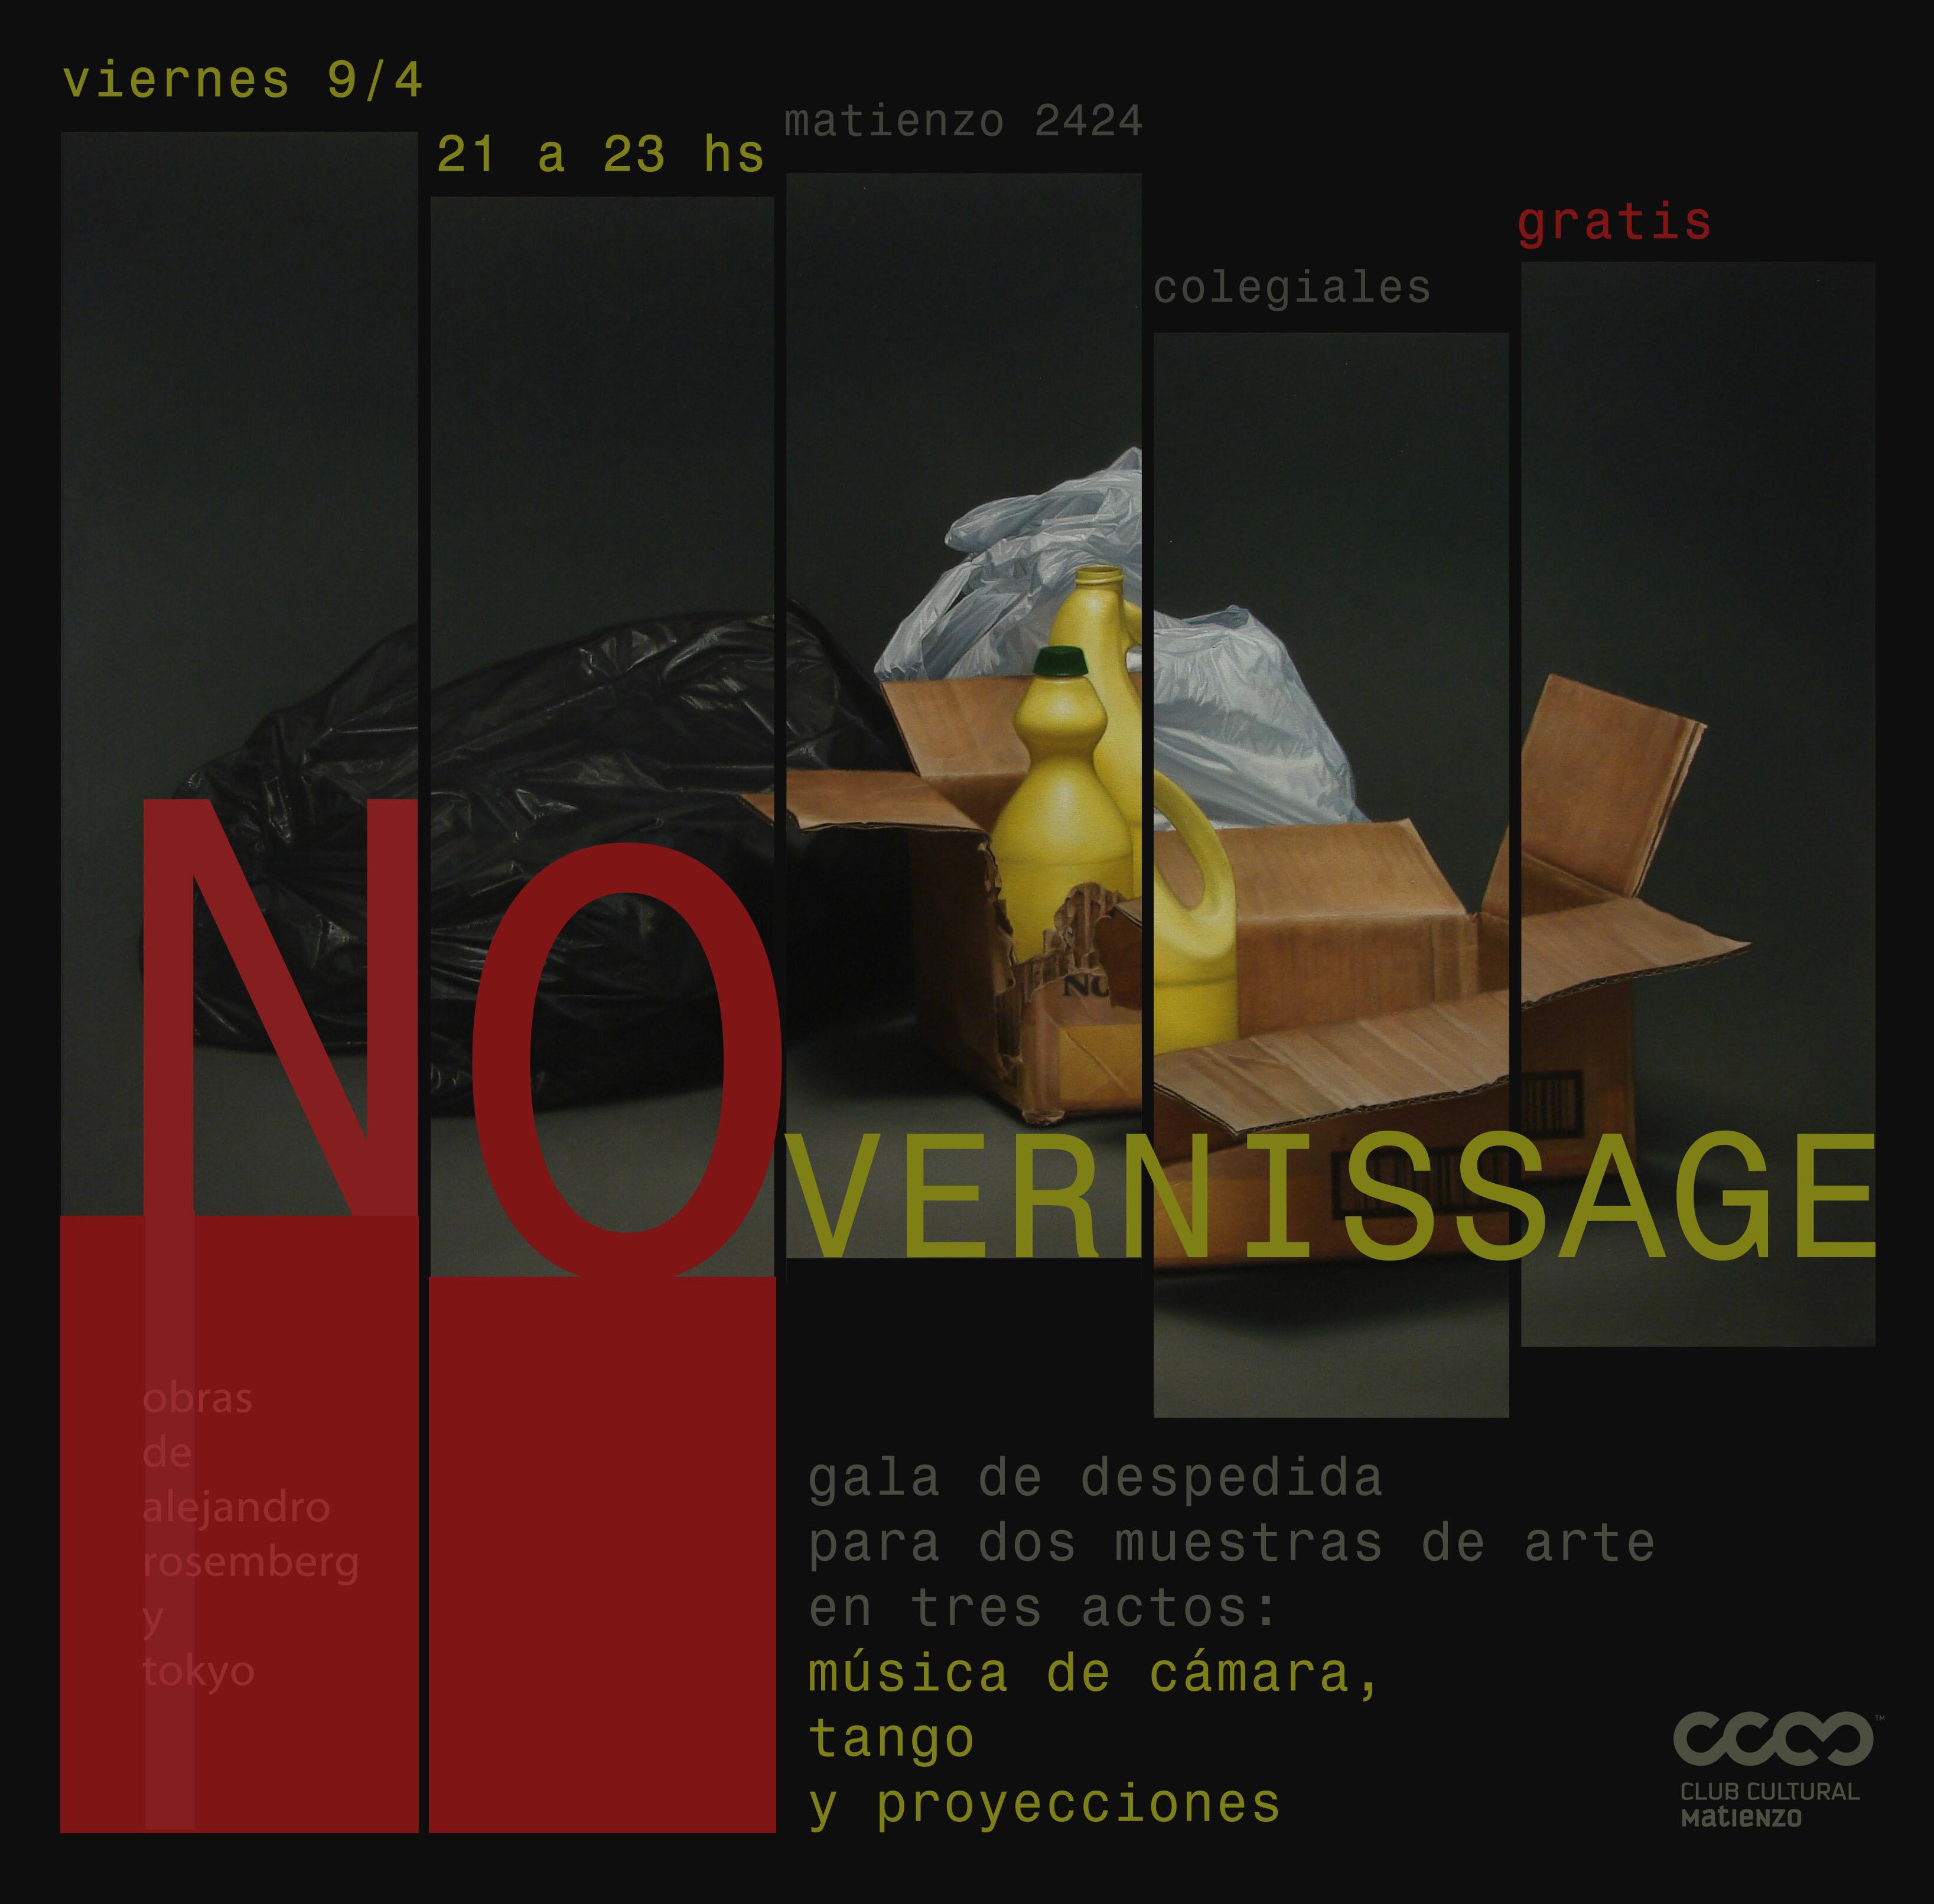 http://clubculturalmatienzo.files.wordpress.com/2010/04/novernis.jpg?=400